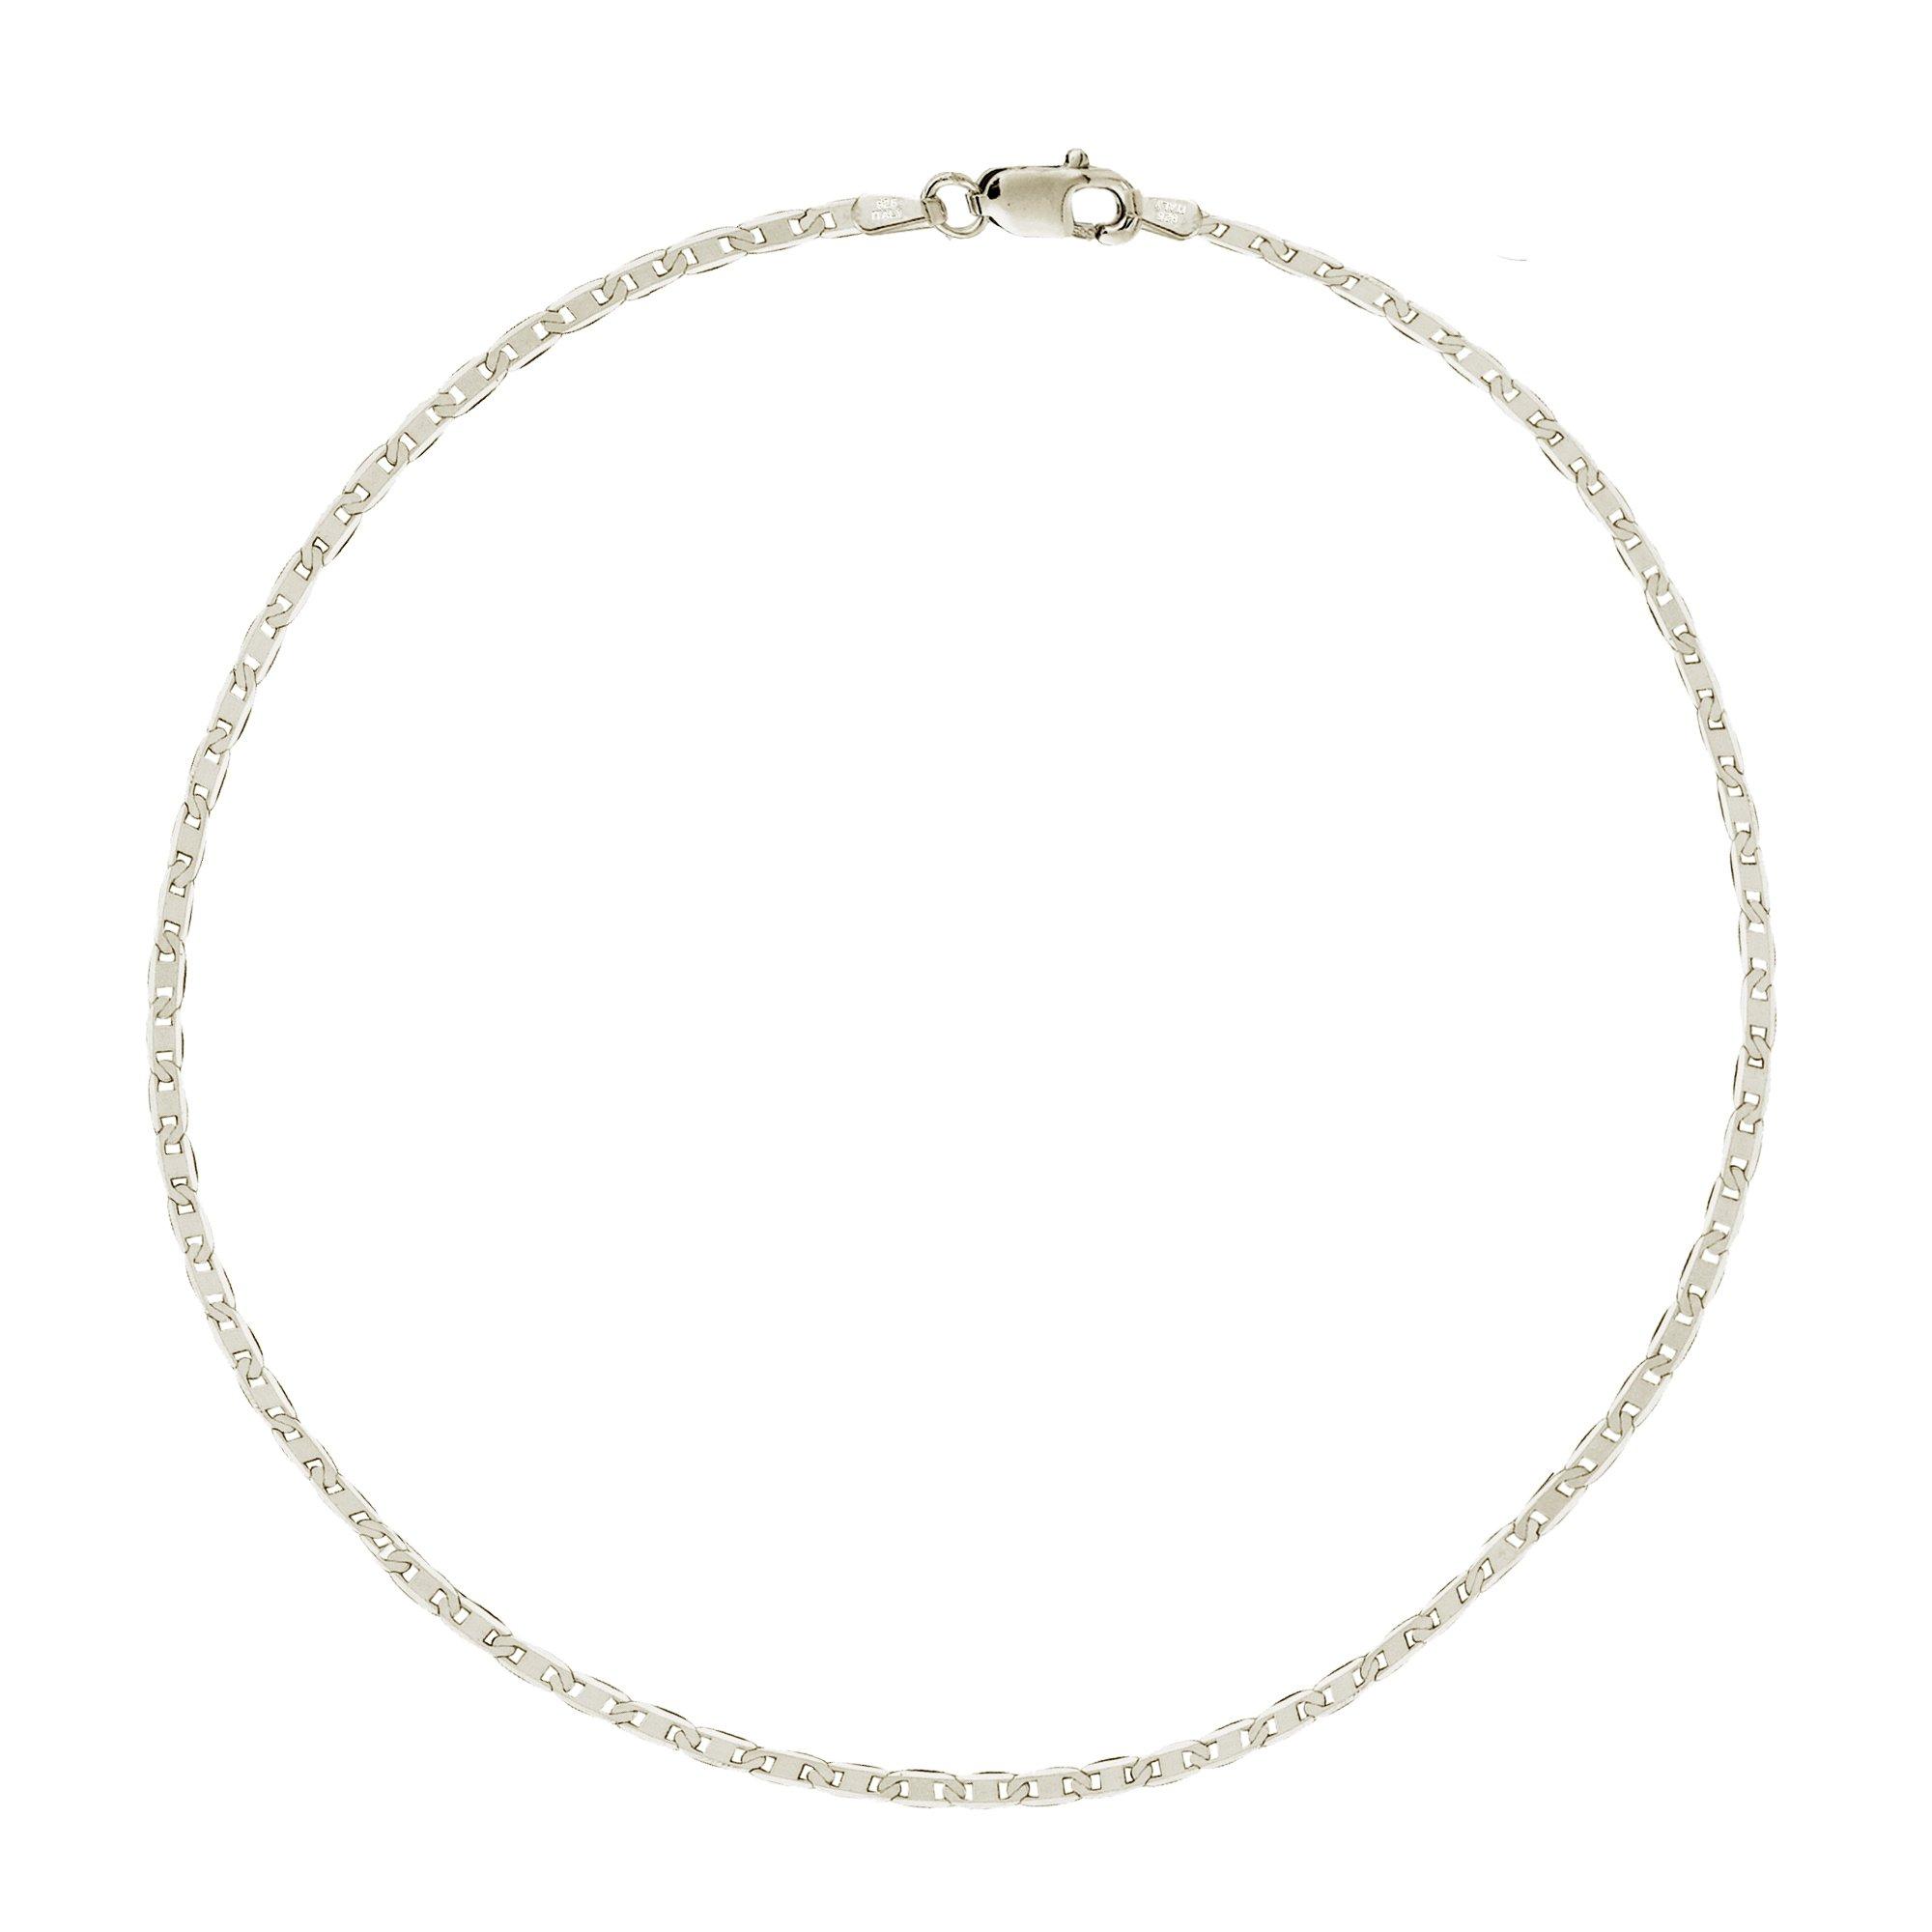 Sterling Silver Italian Mariner Link Chain Anklet or Bracelet (Dainty or Regular)